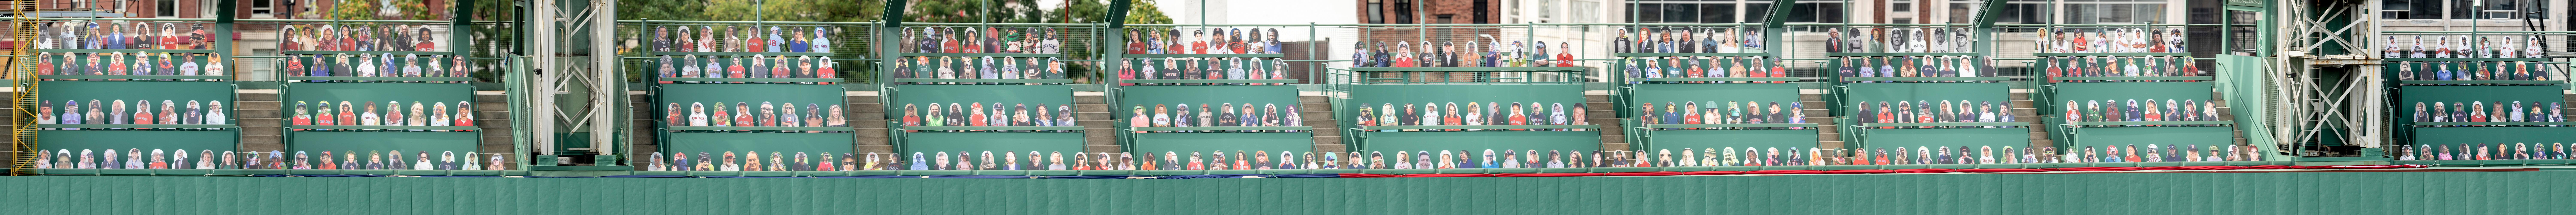 Monster Home Run Challenge Boston Red Sox